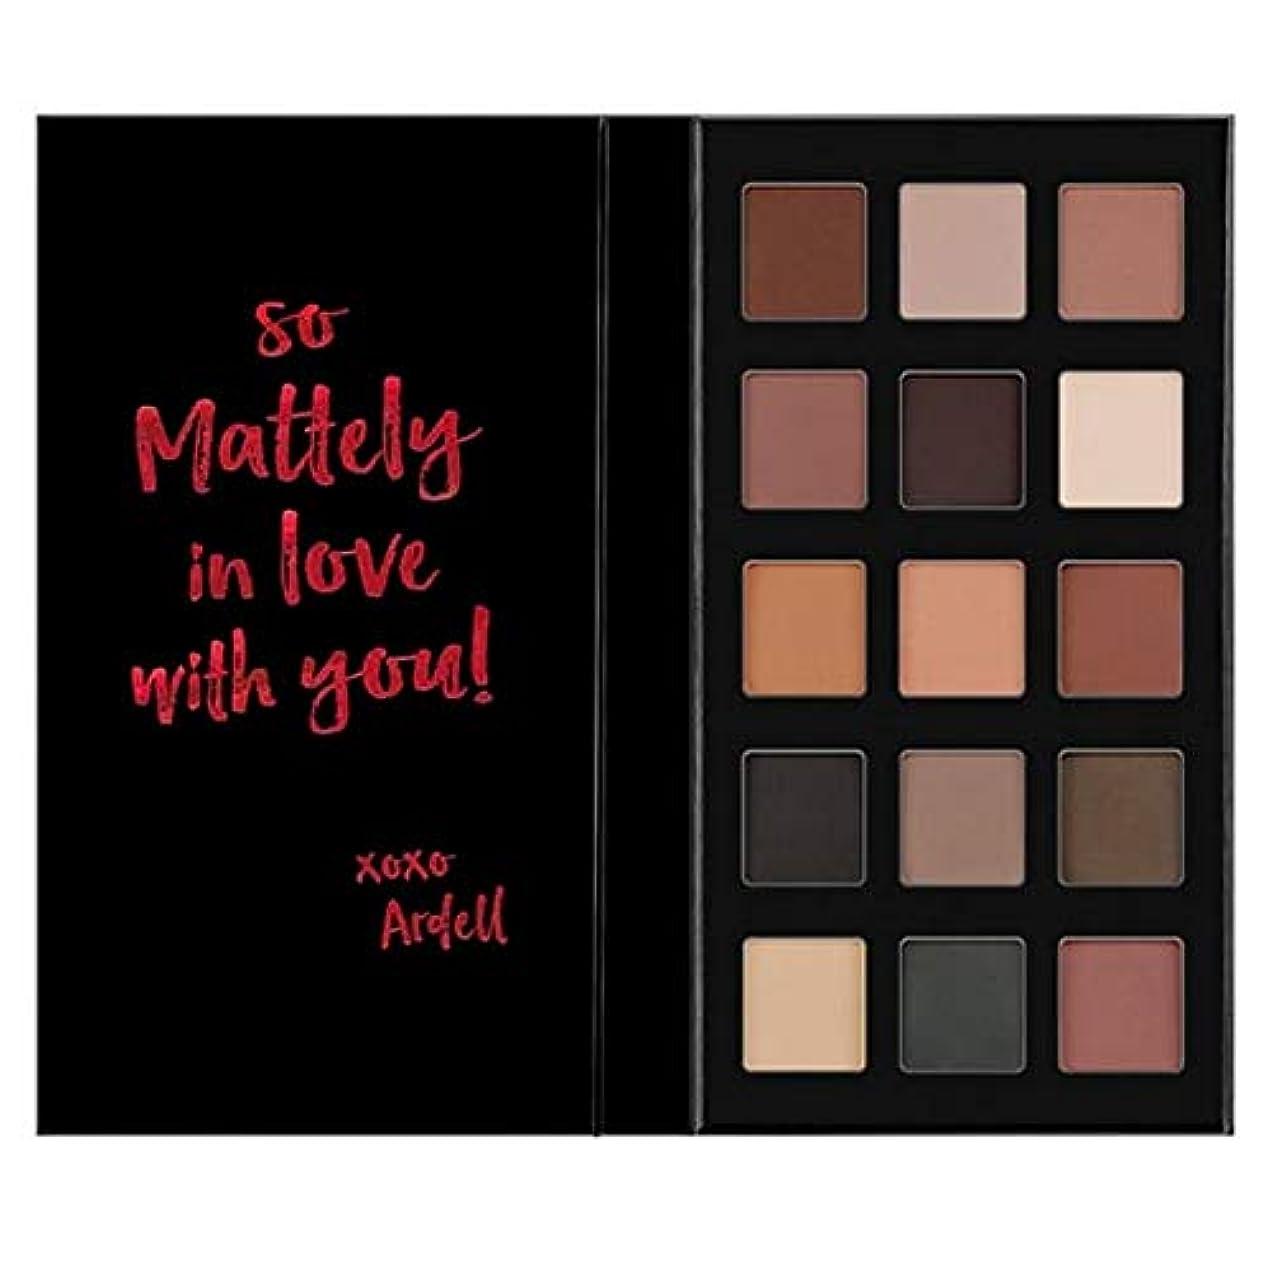 [Ardell] Ardell美のプロアイシャドウパレットマット - Ardell Beauty Pro Eyeshadow Palette Matte [並行輸入品]